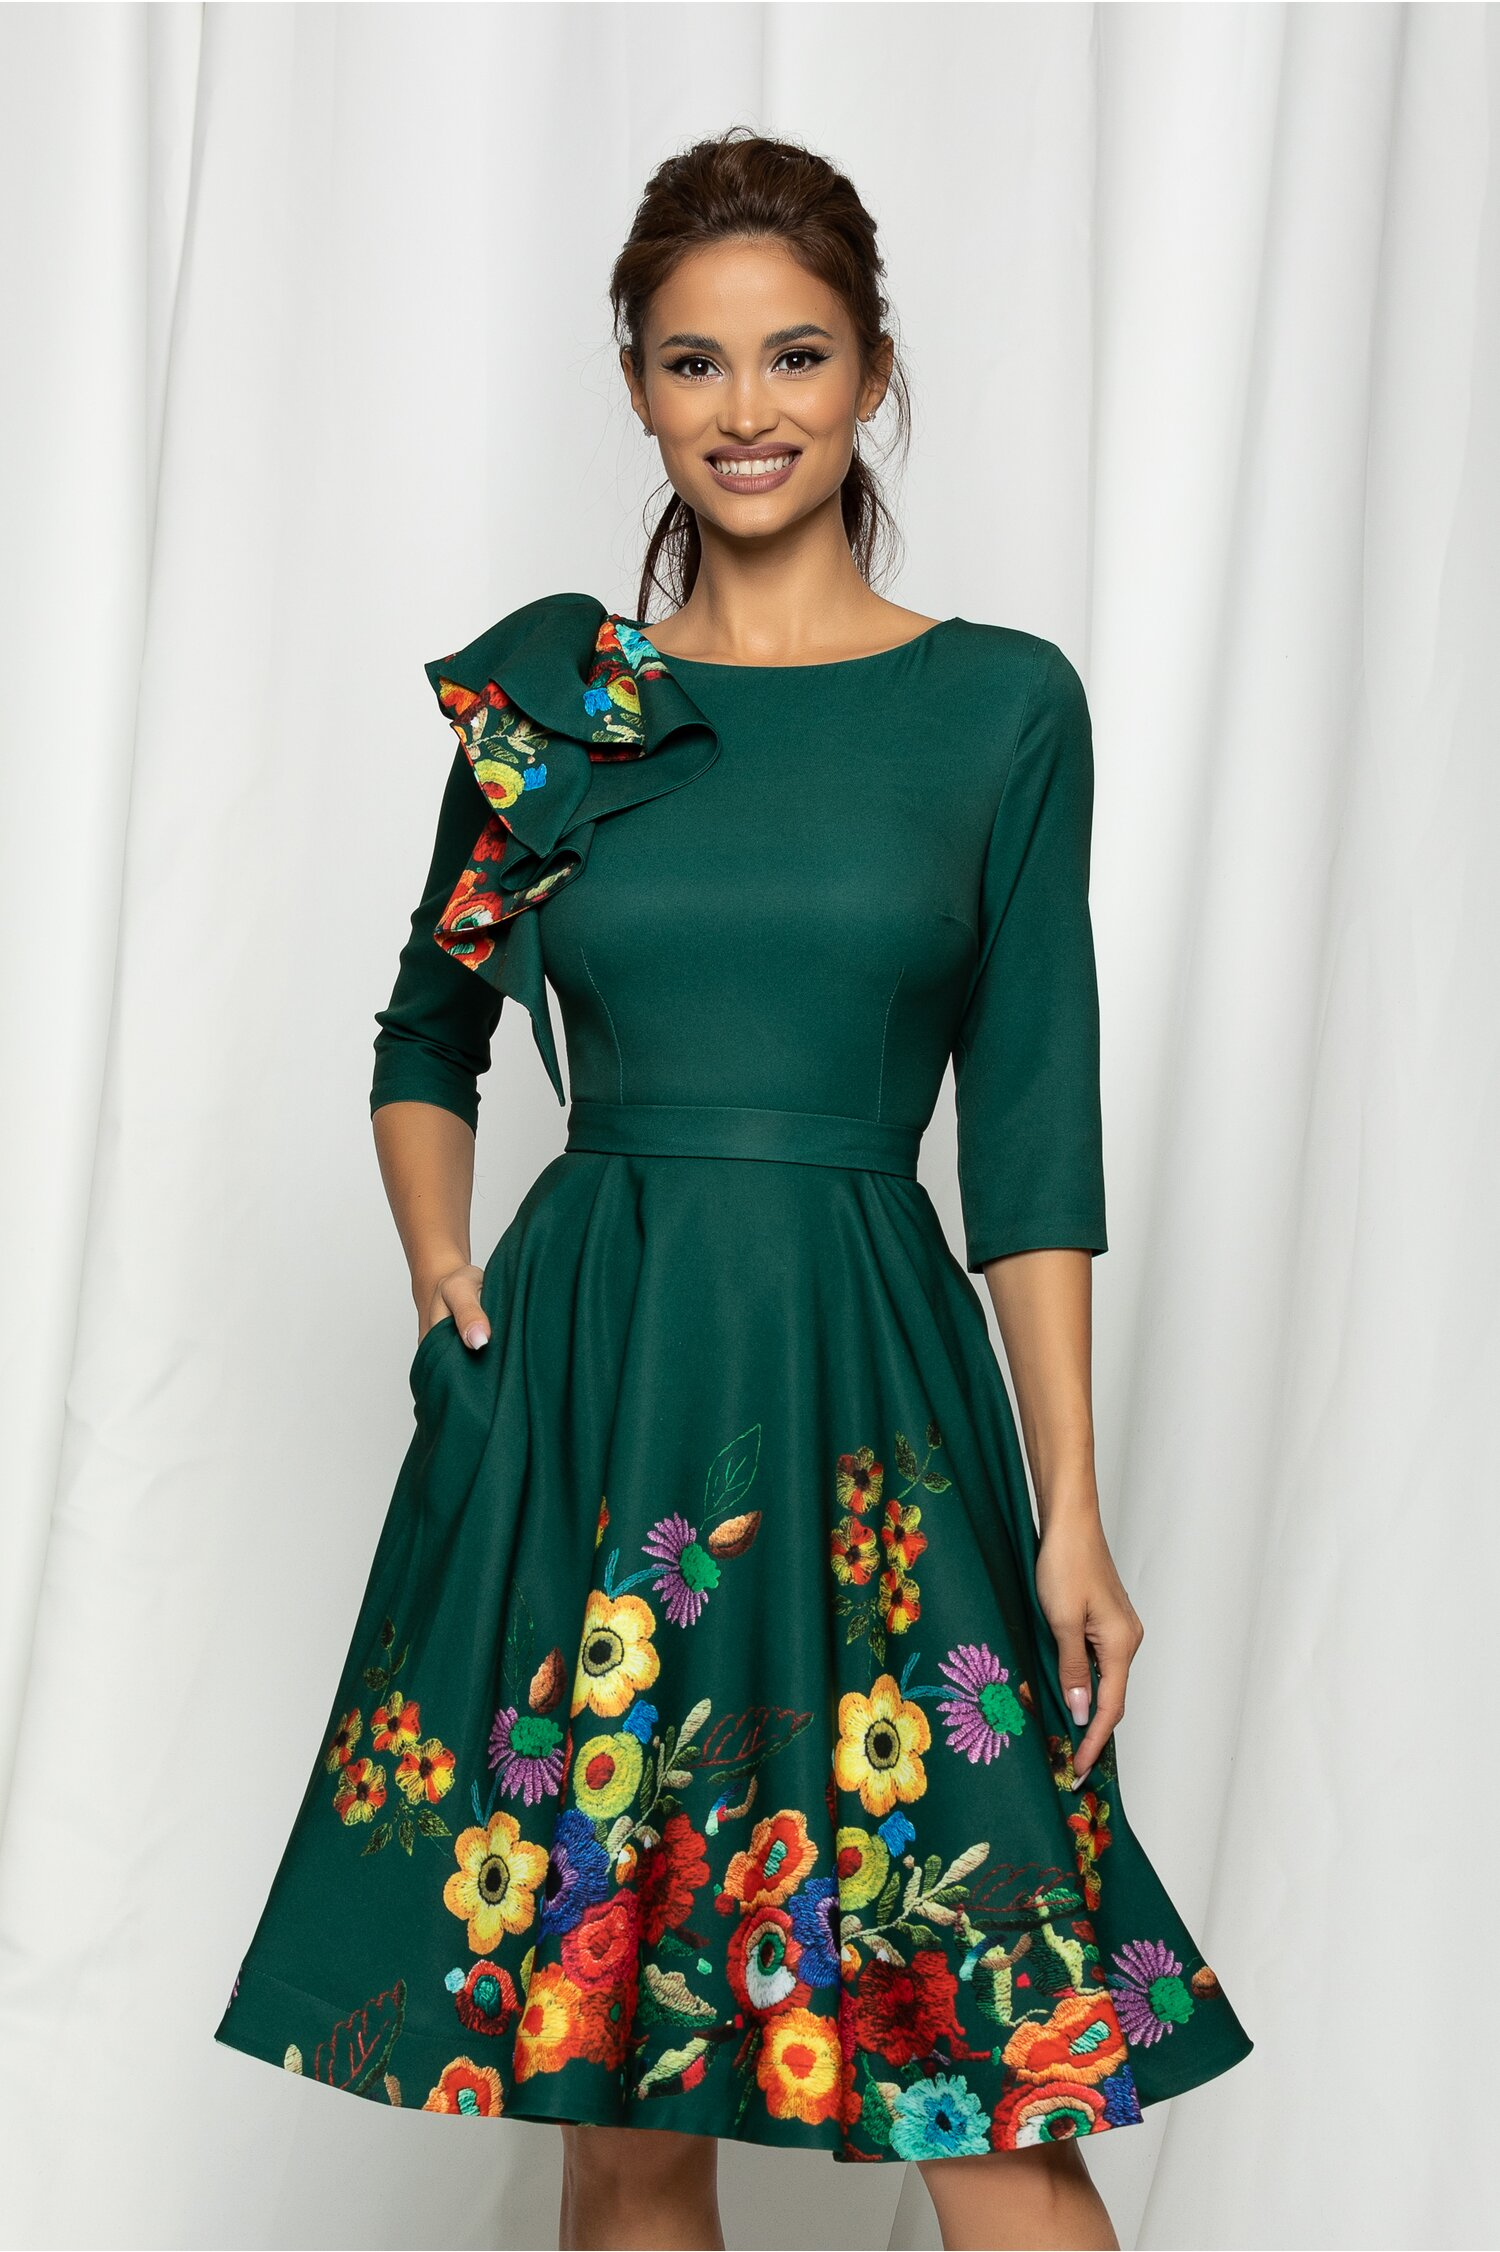 Rochie MBG verde cu imprimeu floral